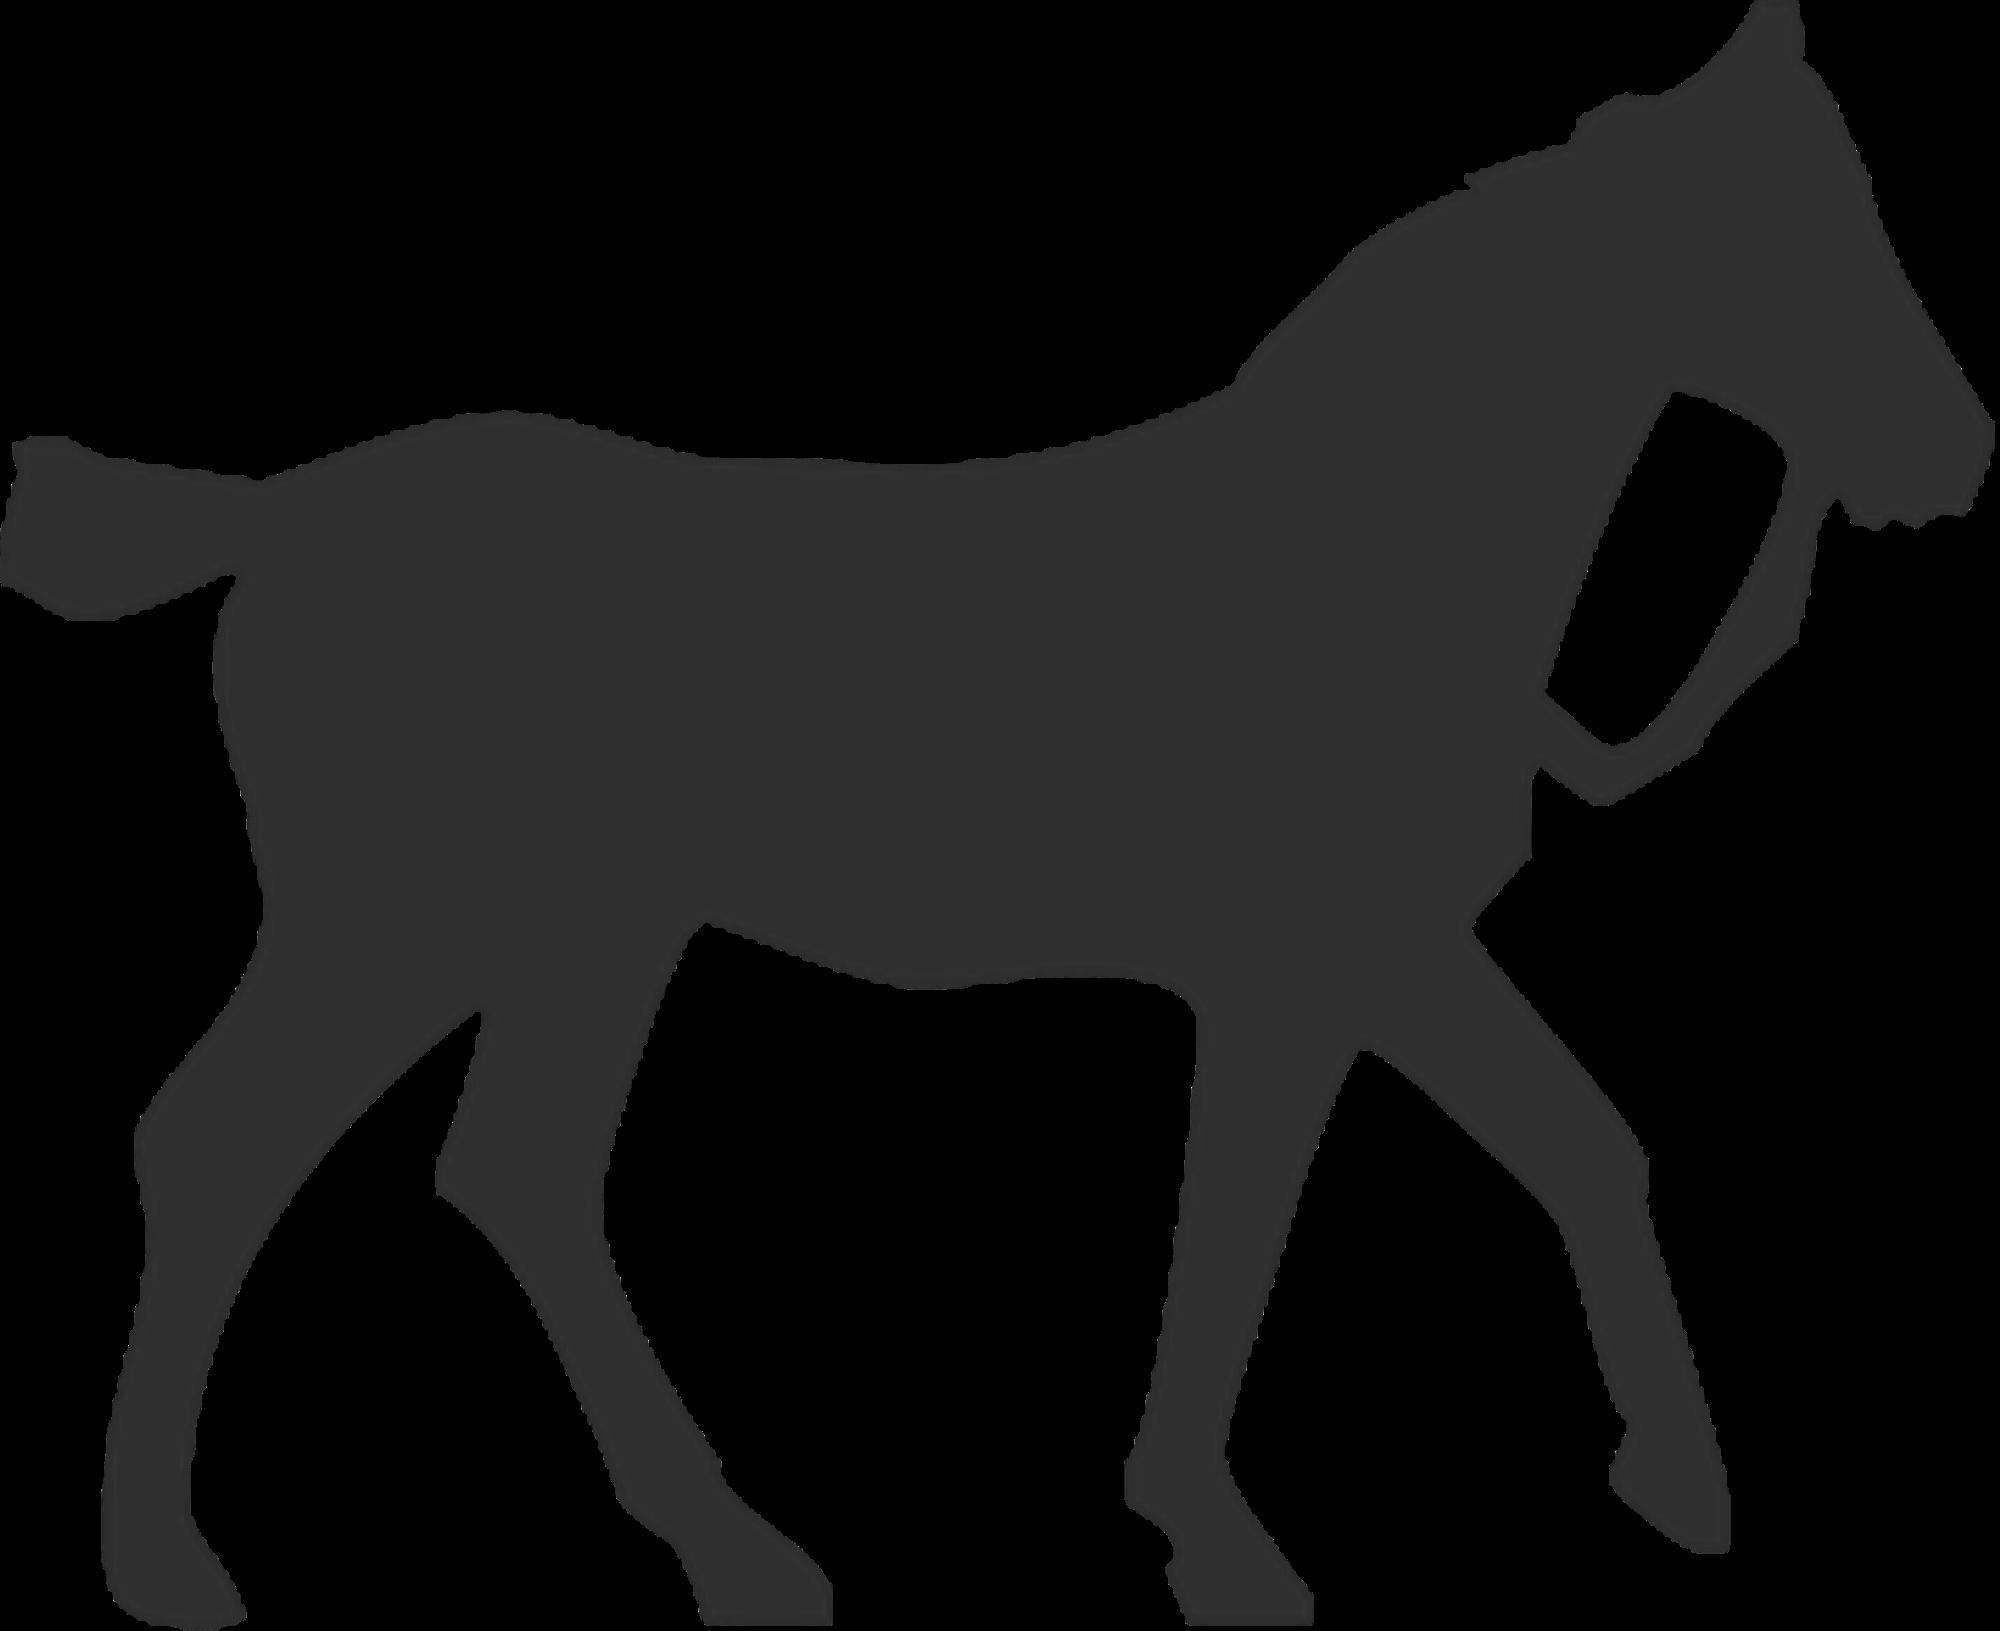 Horse Silhouette Equestrian Pet.